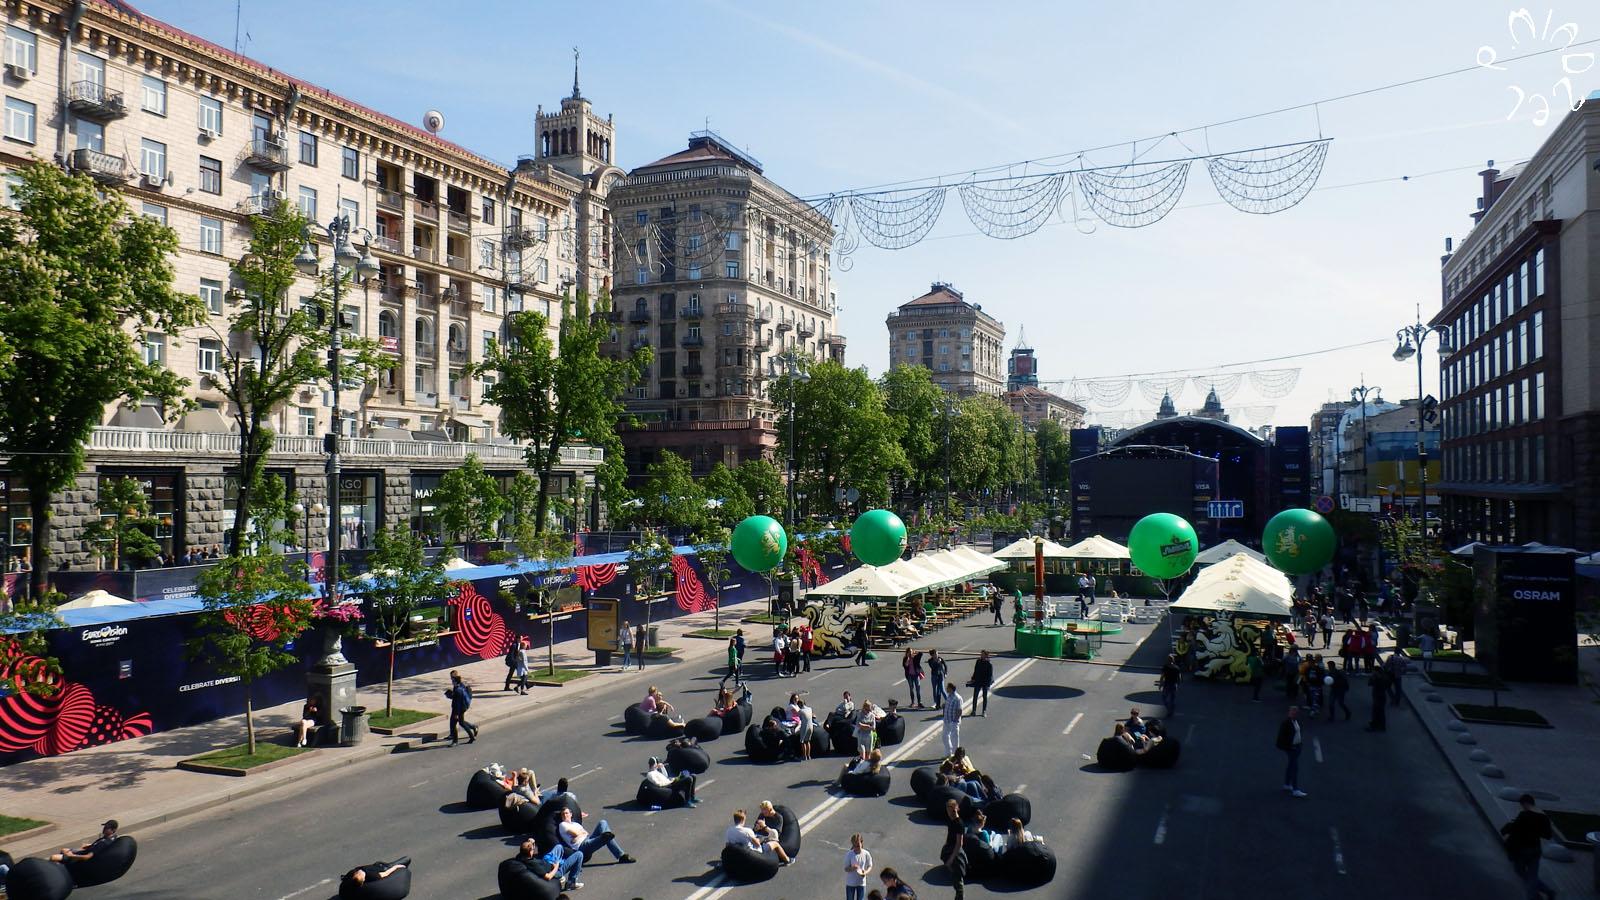 Eurovision Village in Kyiv